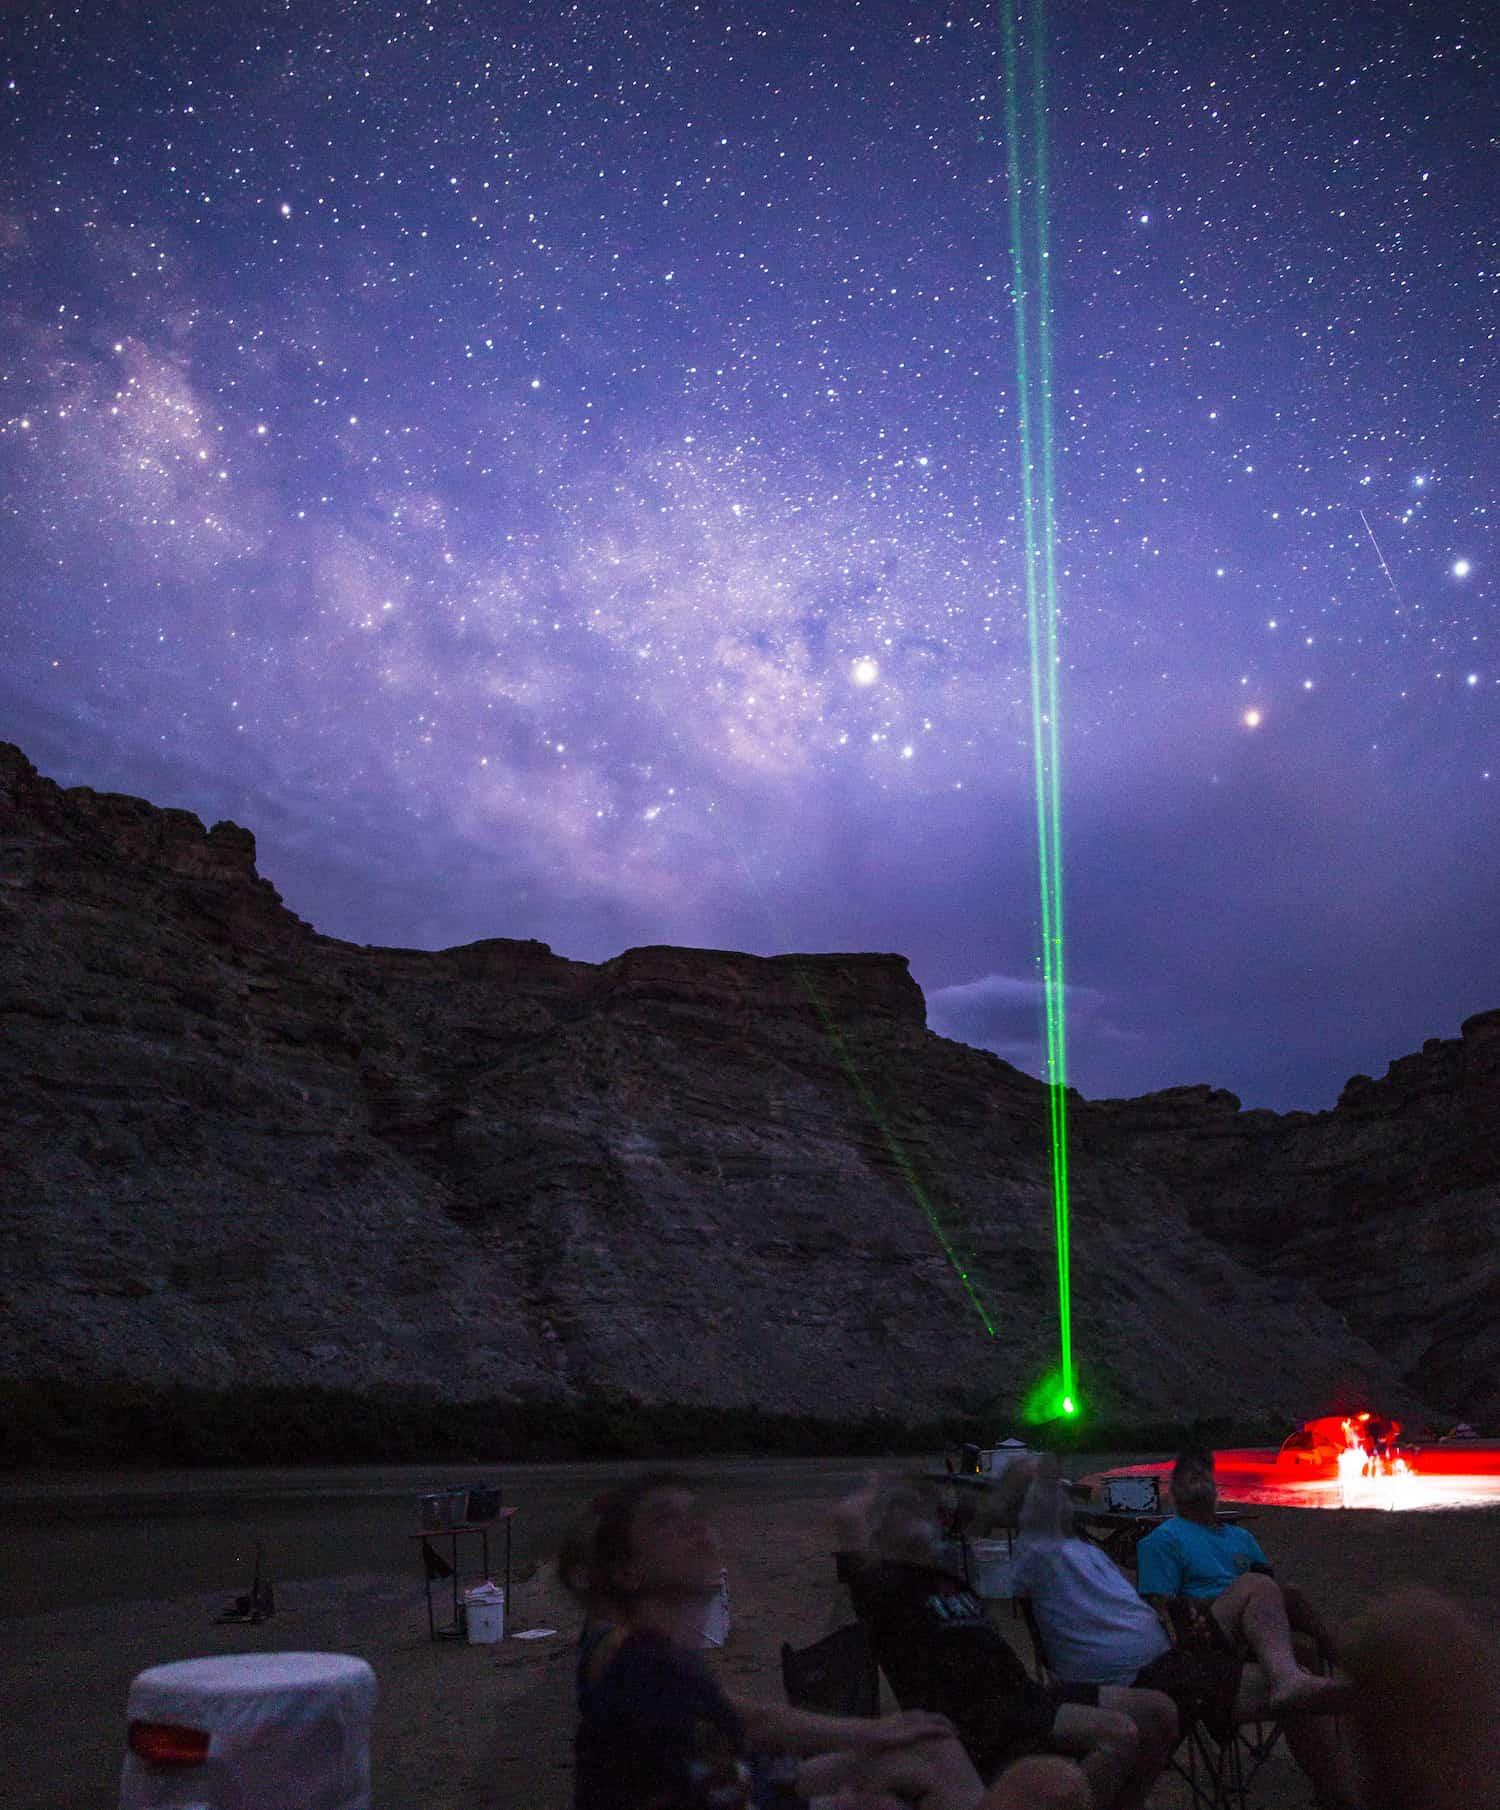 Canyonlands National Park Stargazing - Bettymaya Foott for NPS